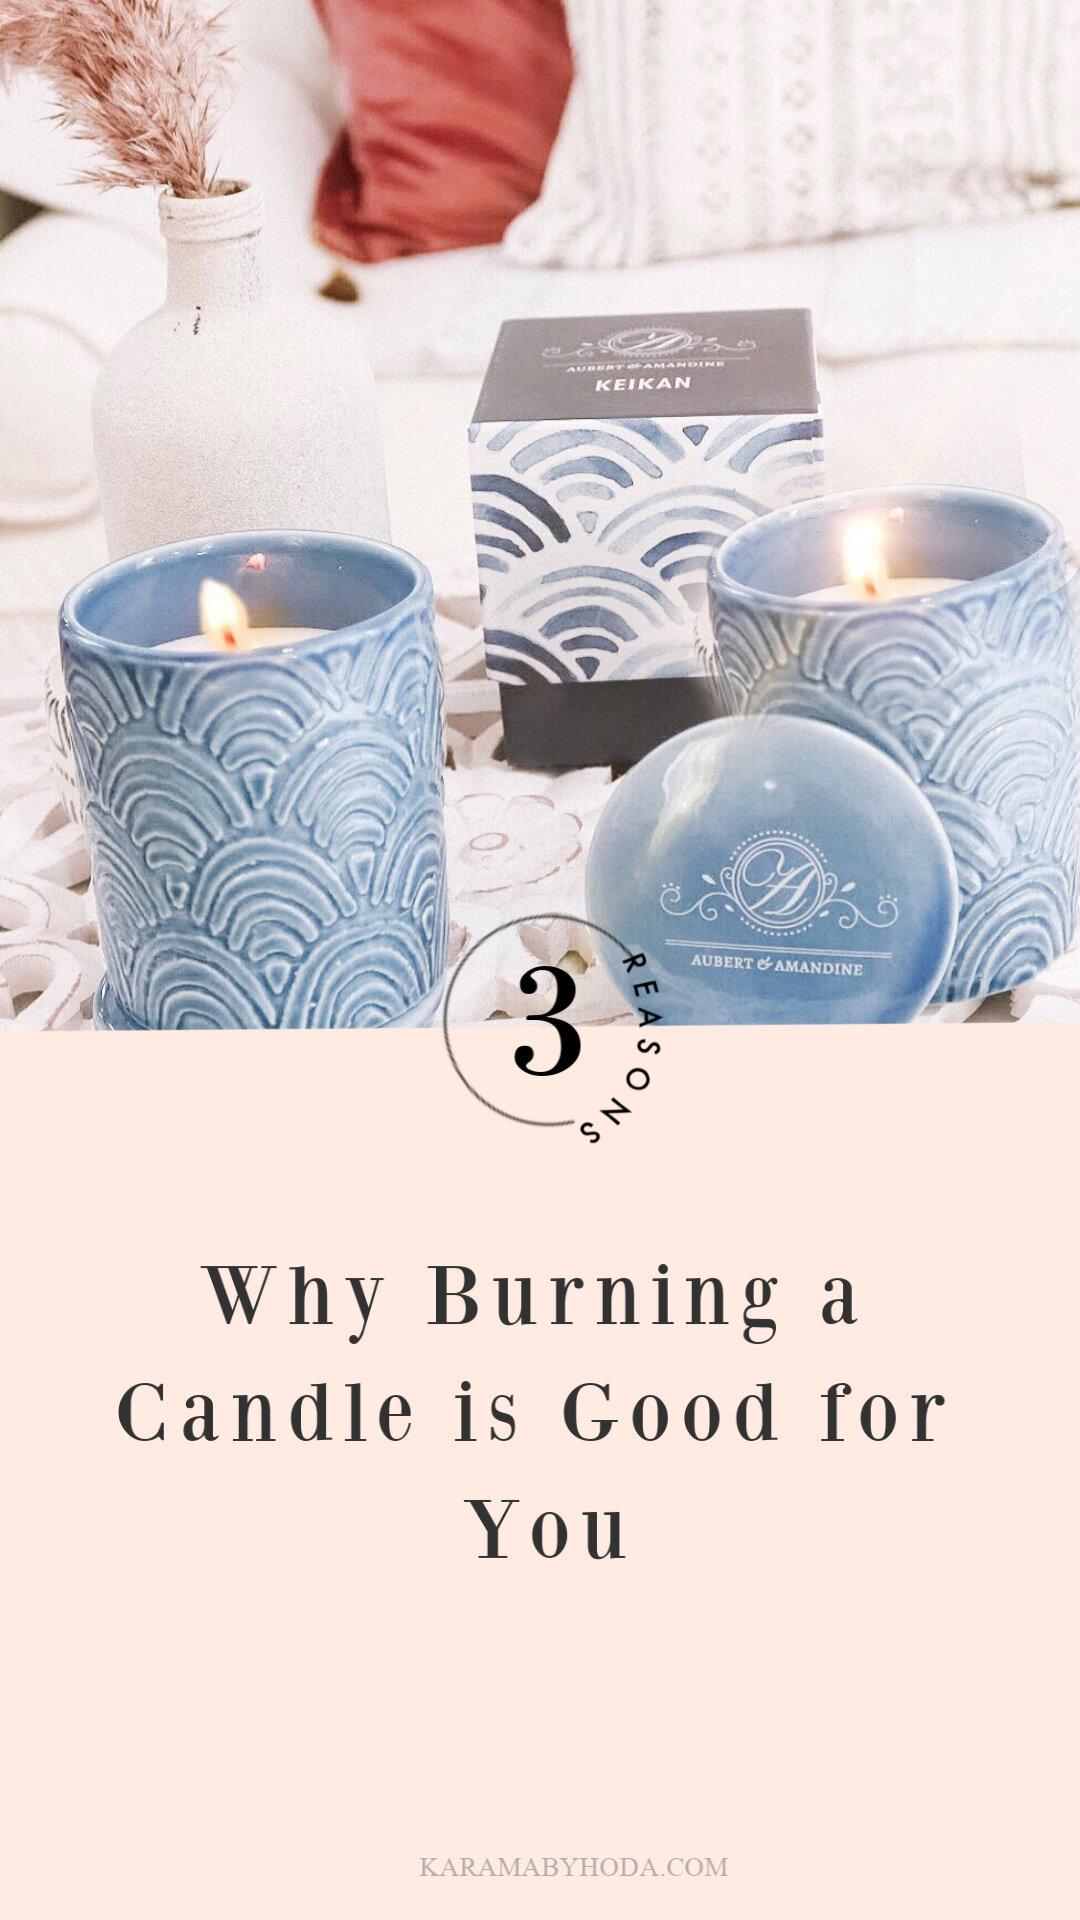 3 REASONS WHY BURNING A CANDLE IS GOOD FOR YOU- Karamabyhoda.jpg